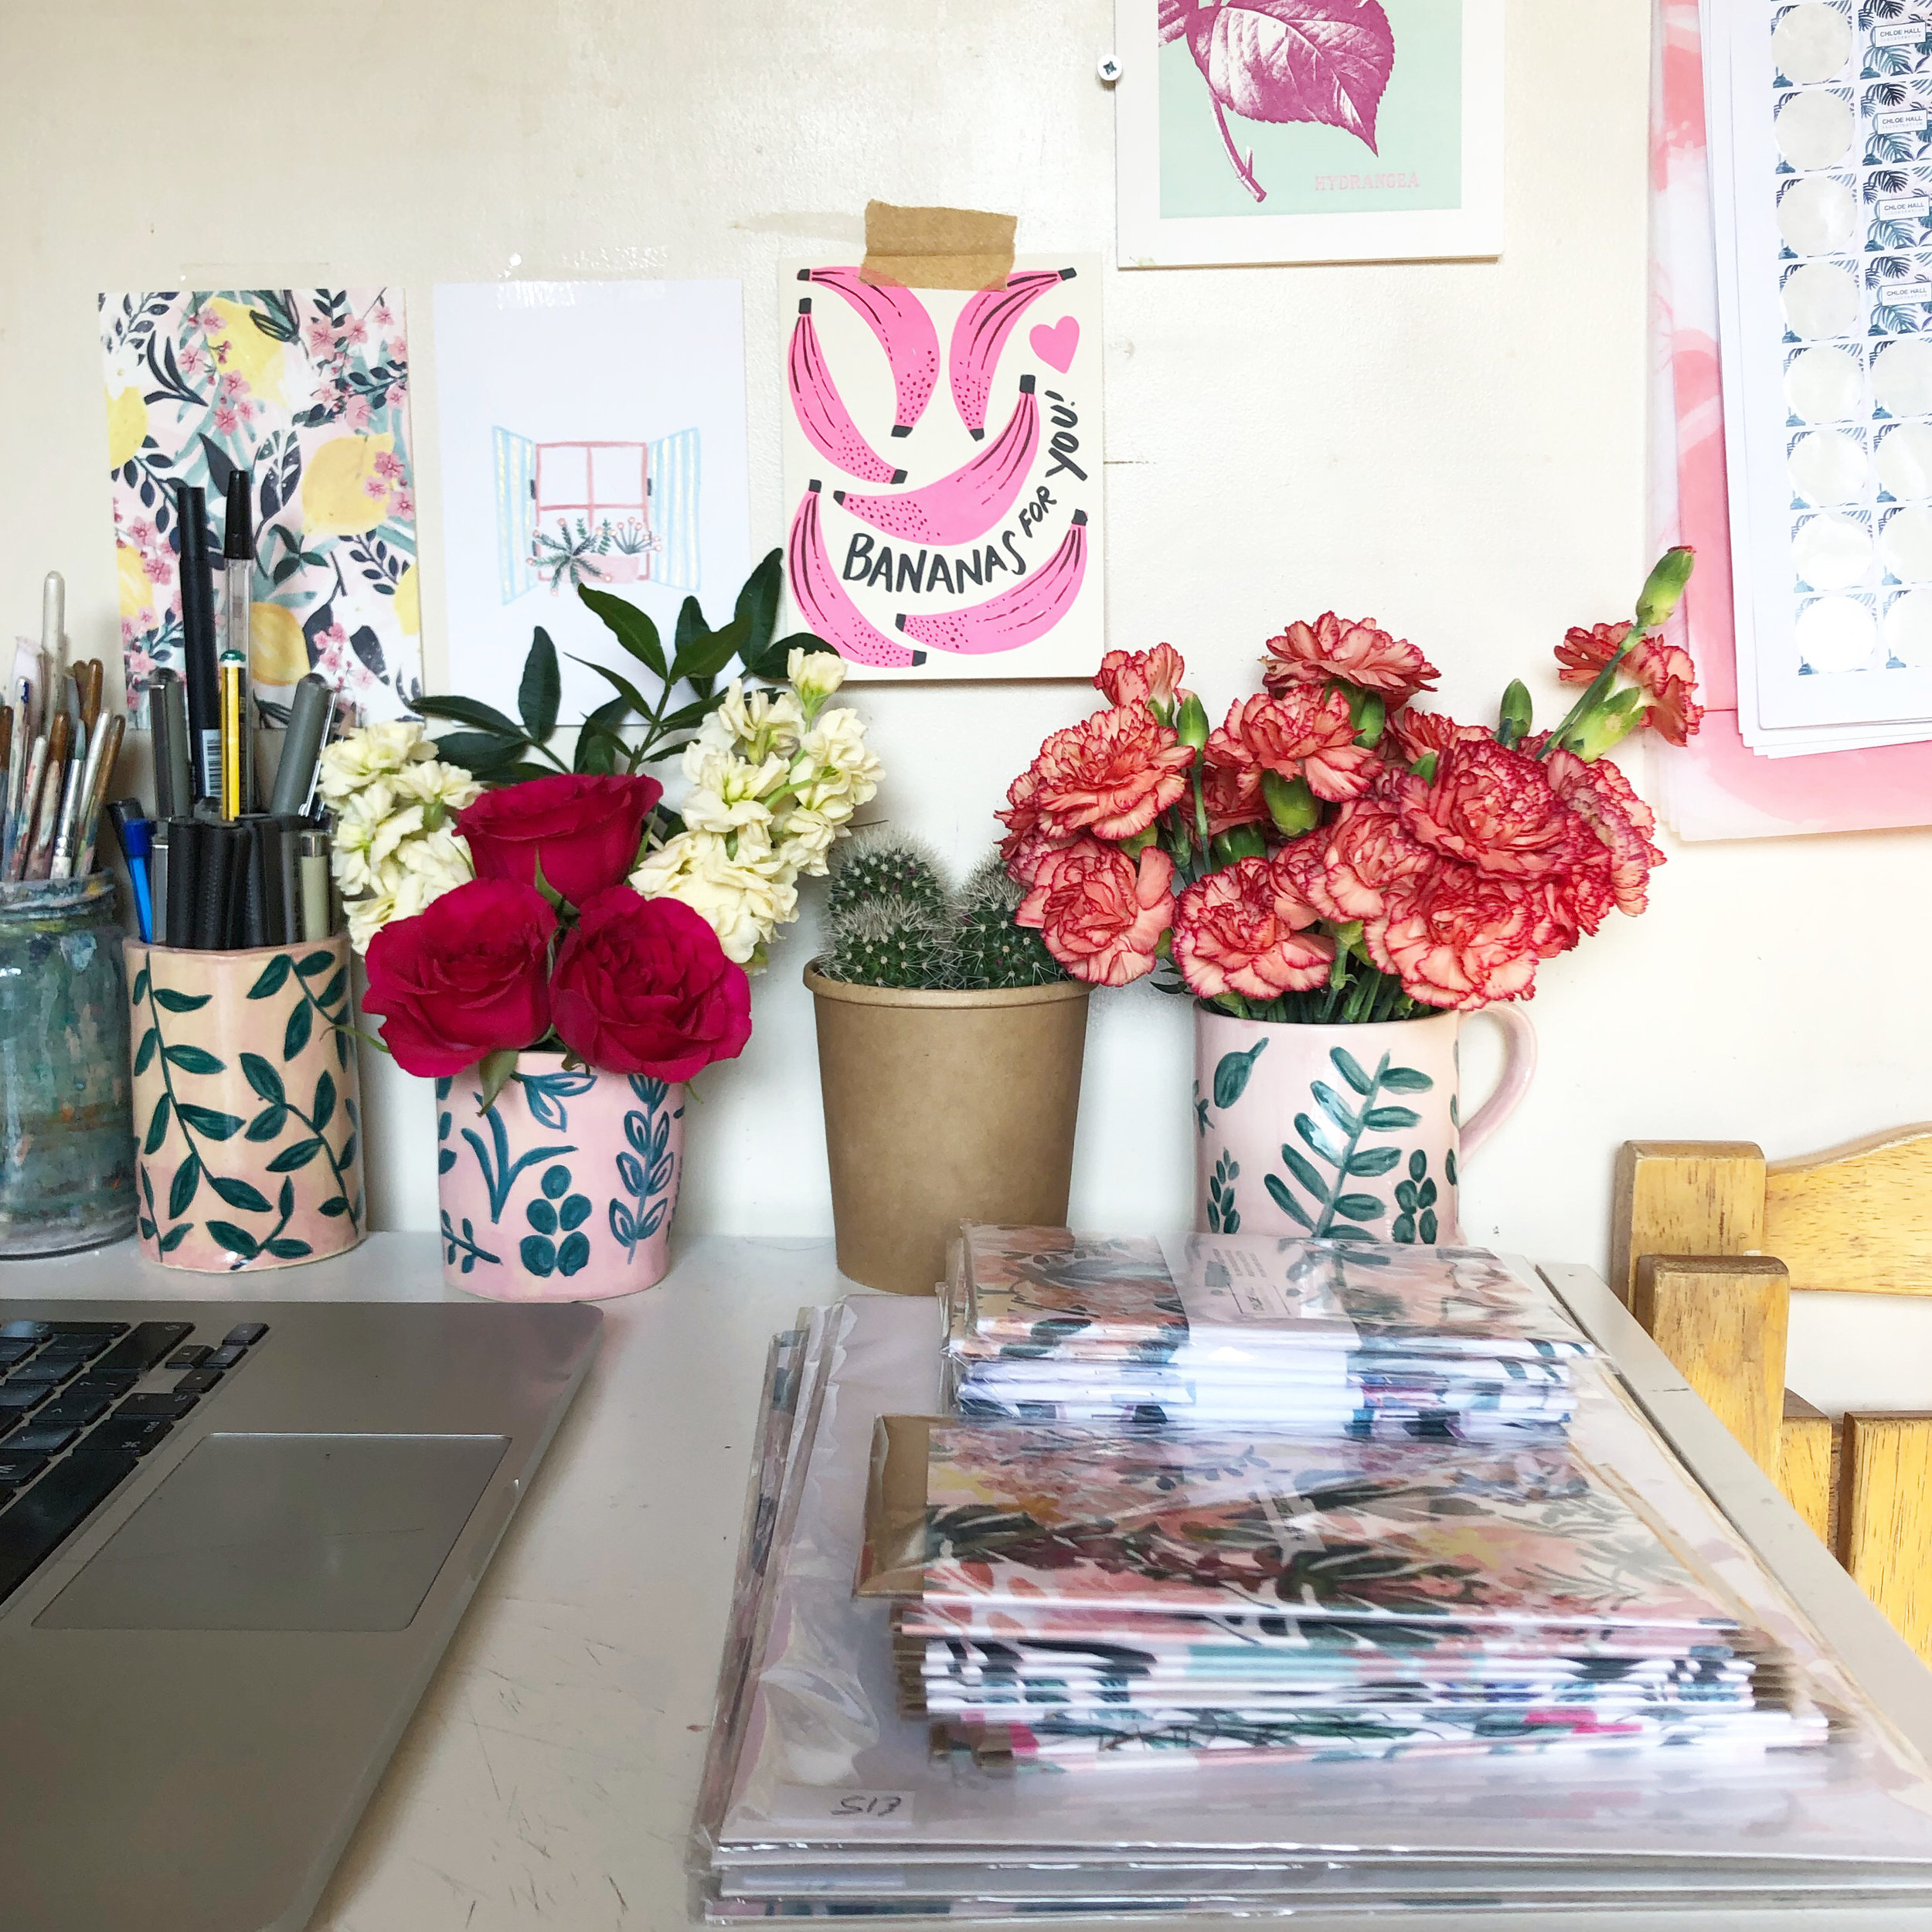 Where Makers Make_Chloe Hall_Illustration_Art Studio Tour_10.png